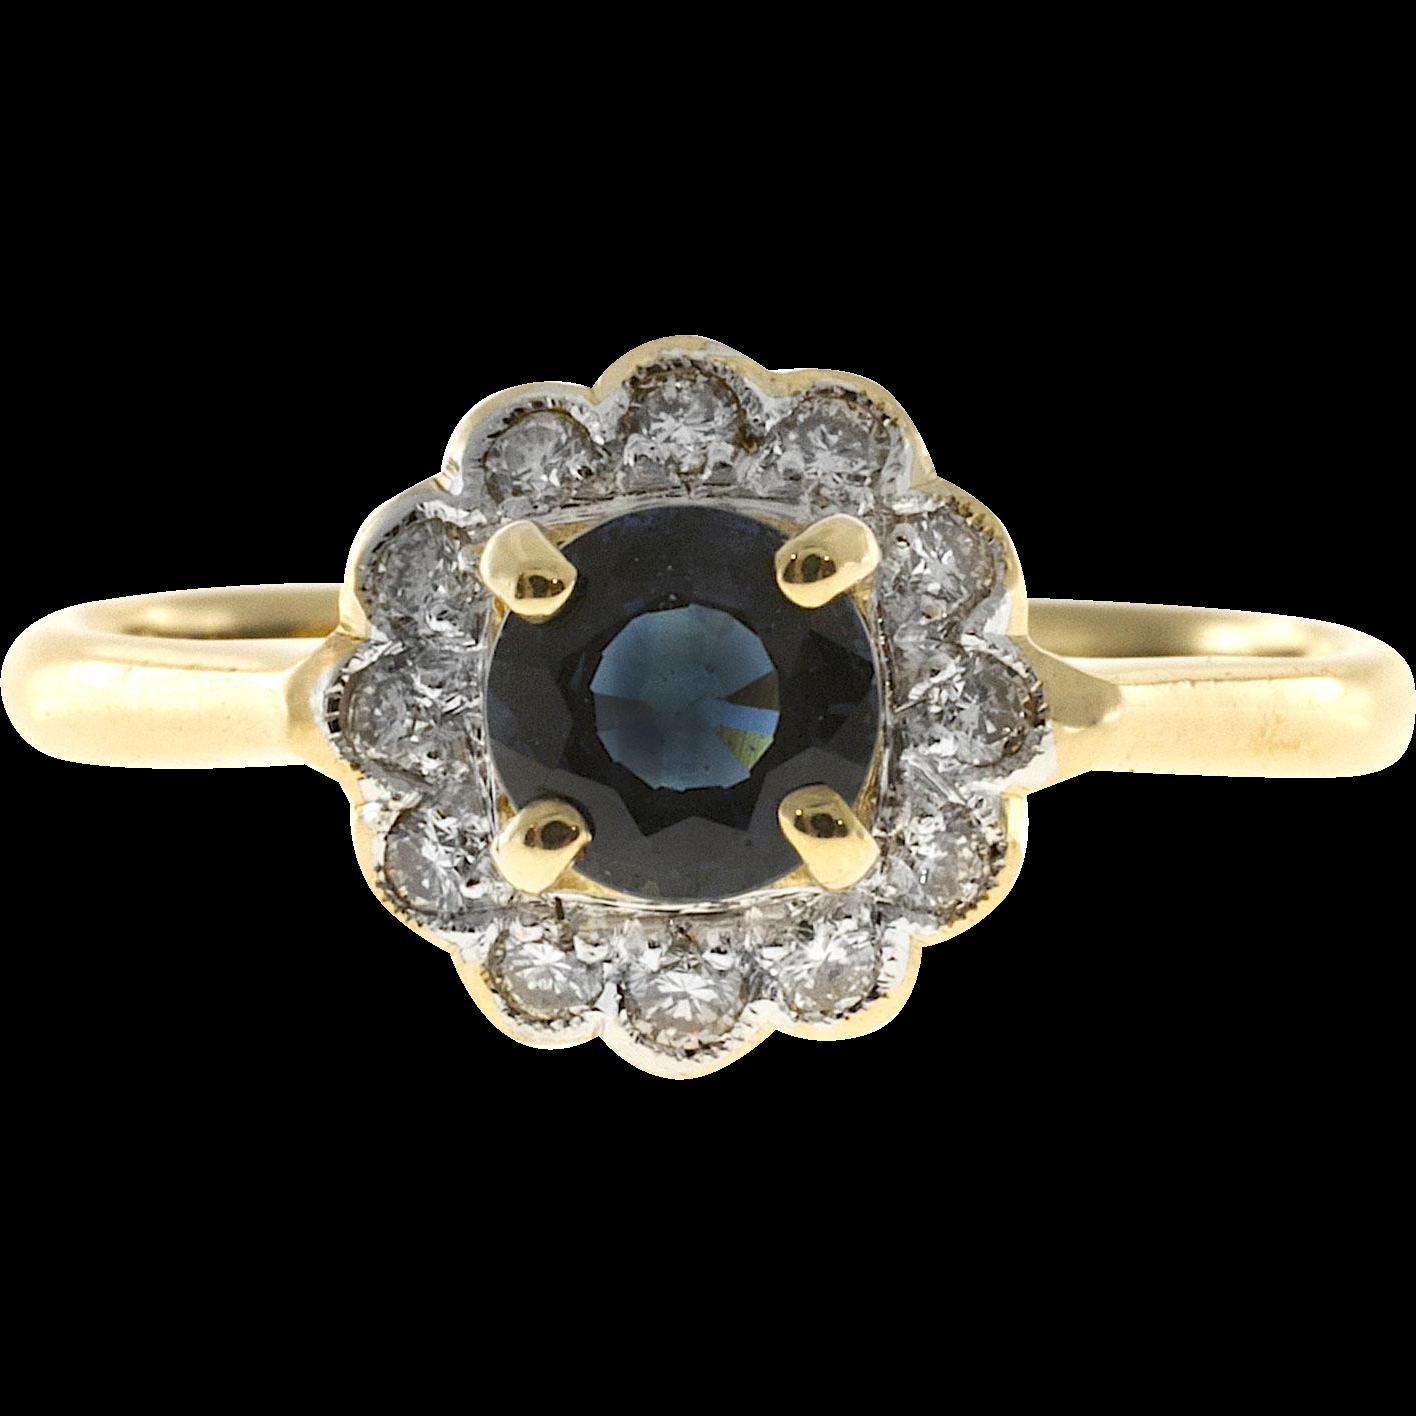 Cornflower Blue Sapphire Diamond Halo 18 Karat Yellow Gold Engagement Ring